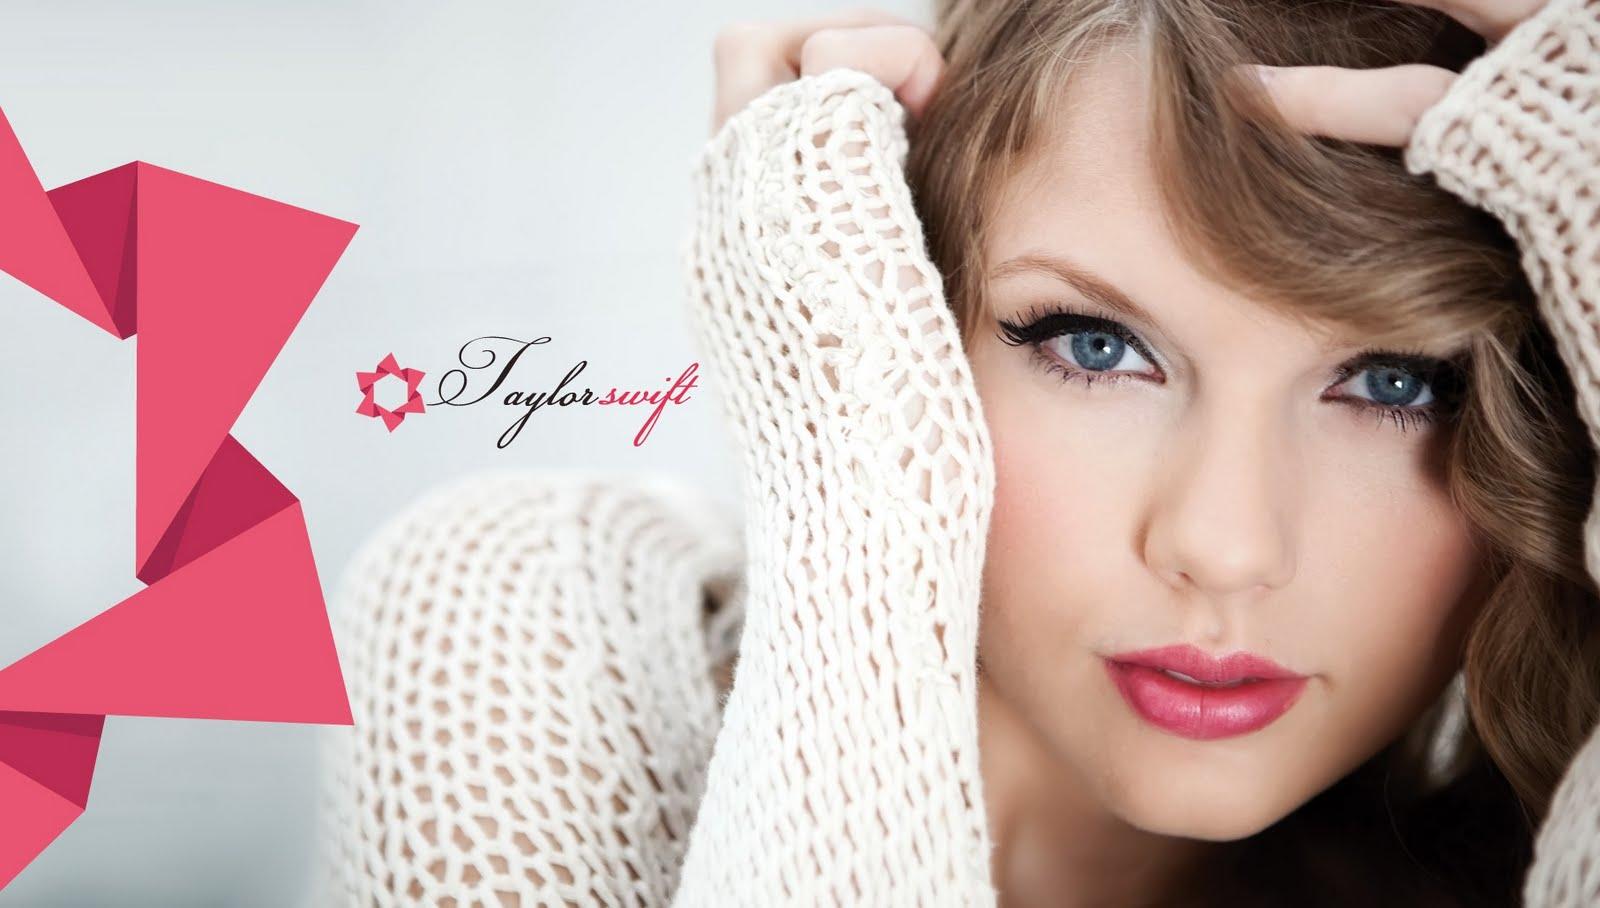 http://3.bp.blogspot.com/-P0obf7aW5GY/Tmdv5W3oroI/AAAAAAAAC0U/-pZhIREu7MI/s1600/Hot+Taylor+Swift%2527s+Pictures+%252815%2529.jpg